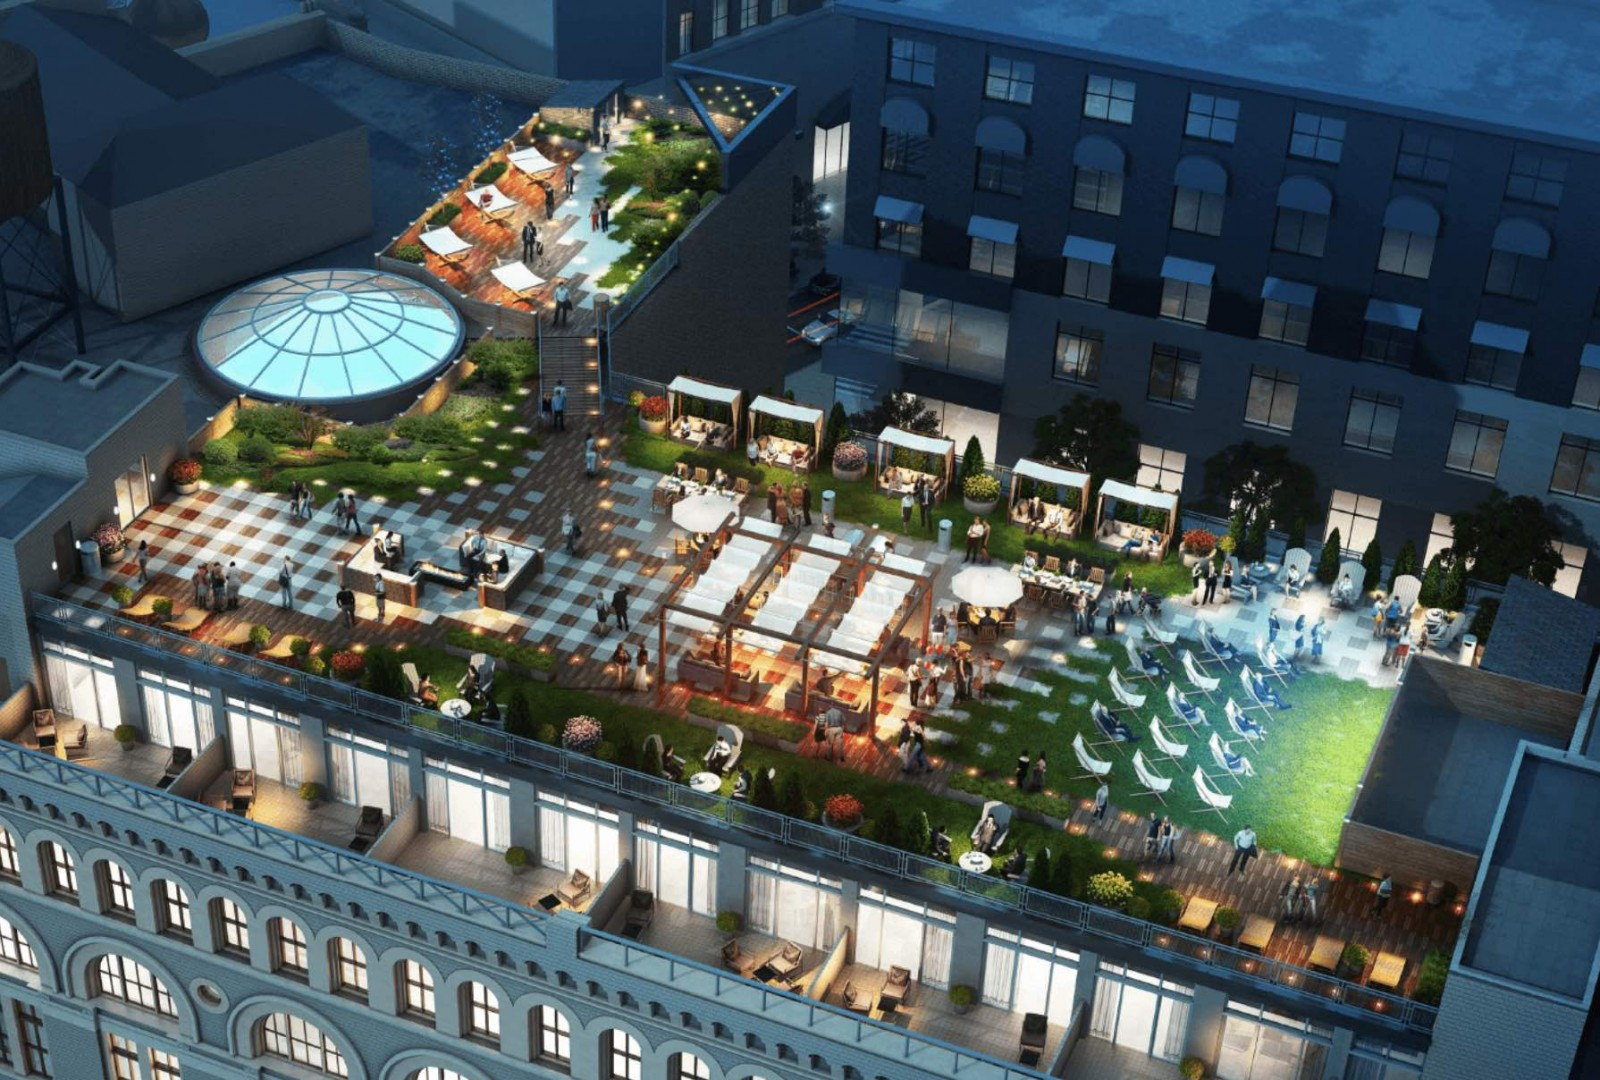 roofdeck-nyc-rooftop-decks-manhattan